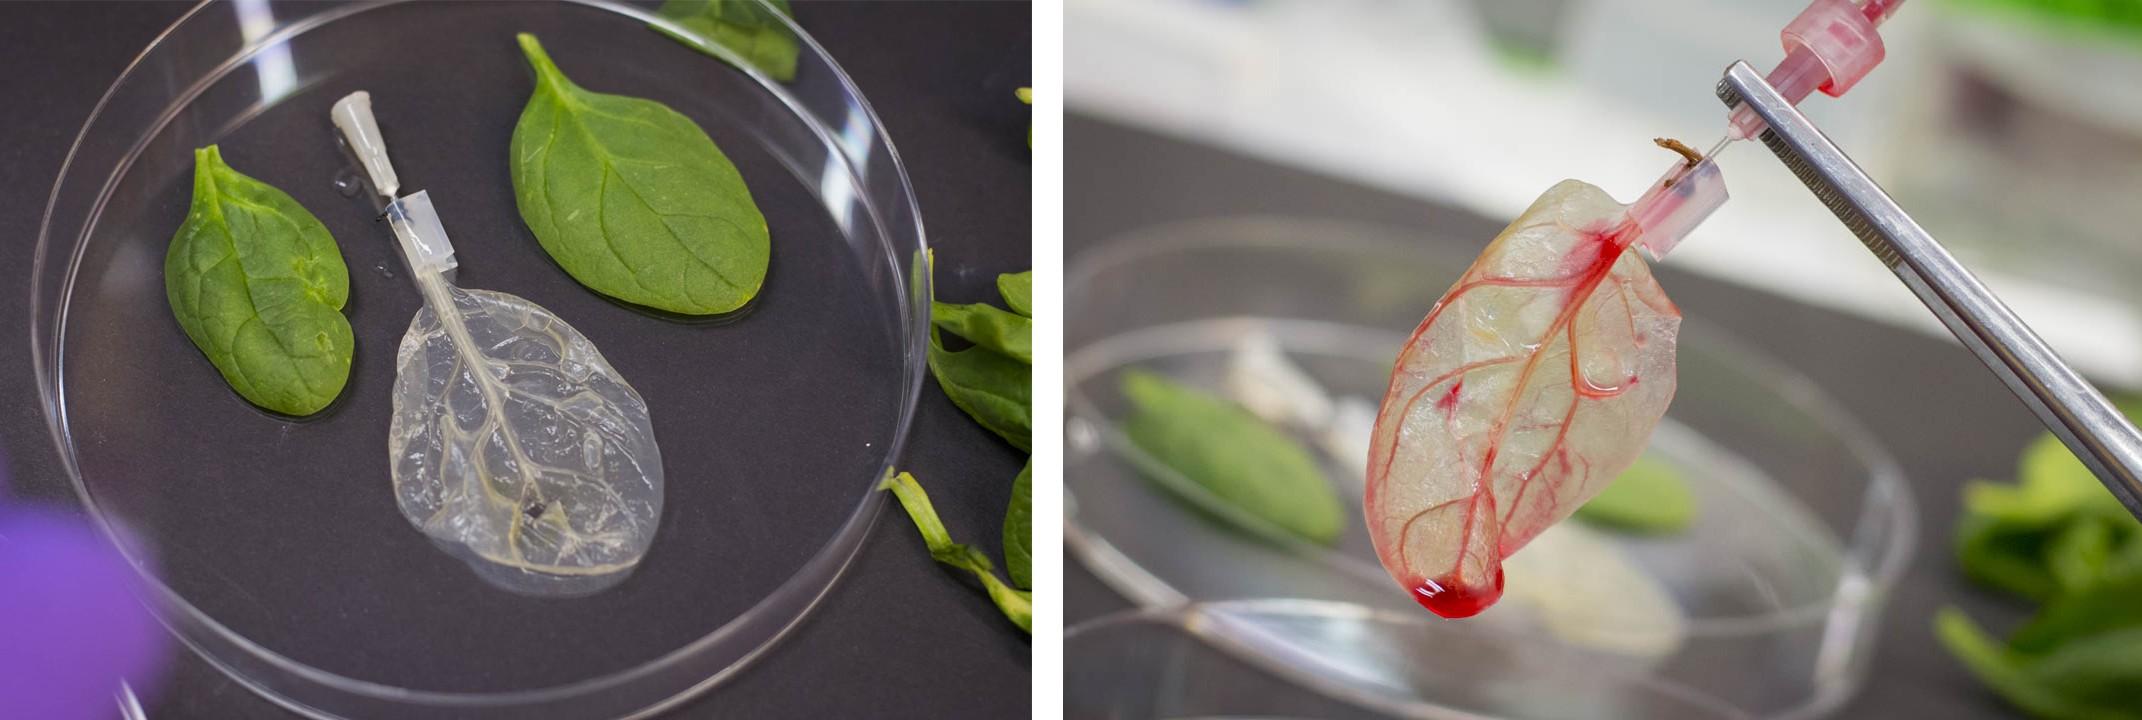 decellularized_leaf